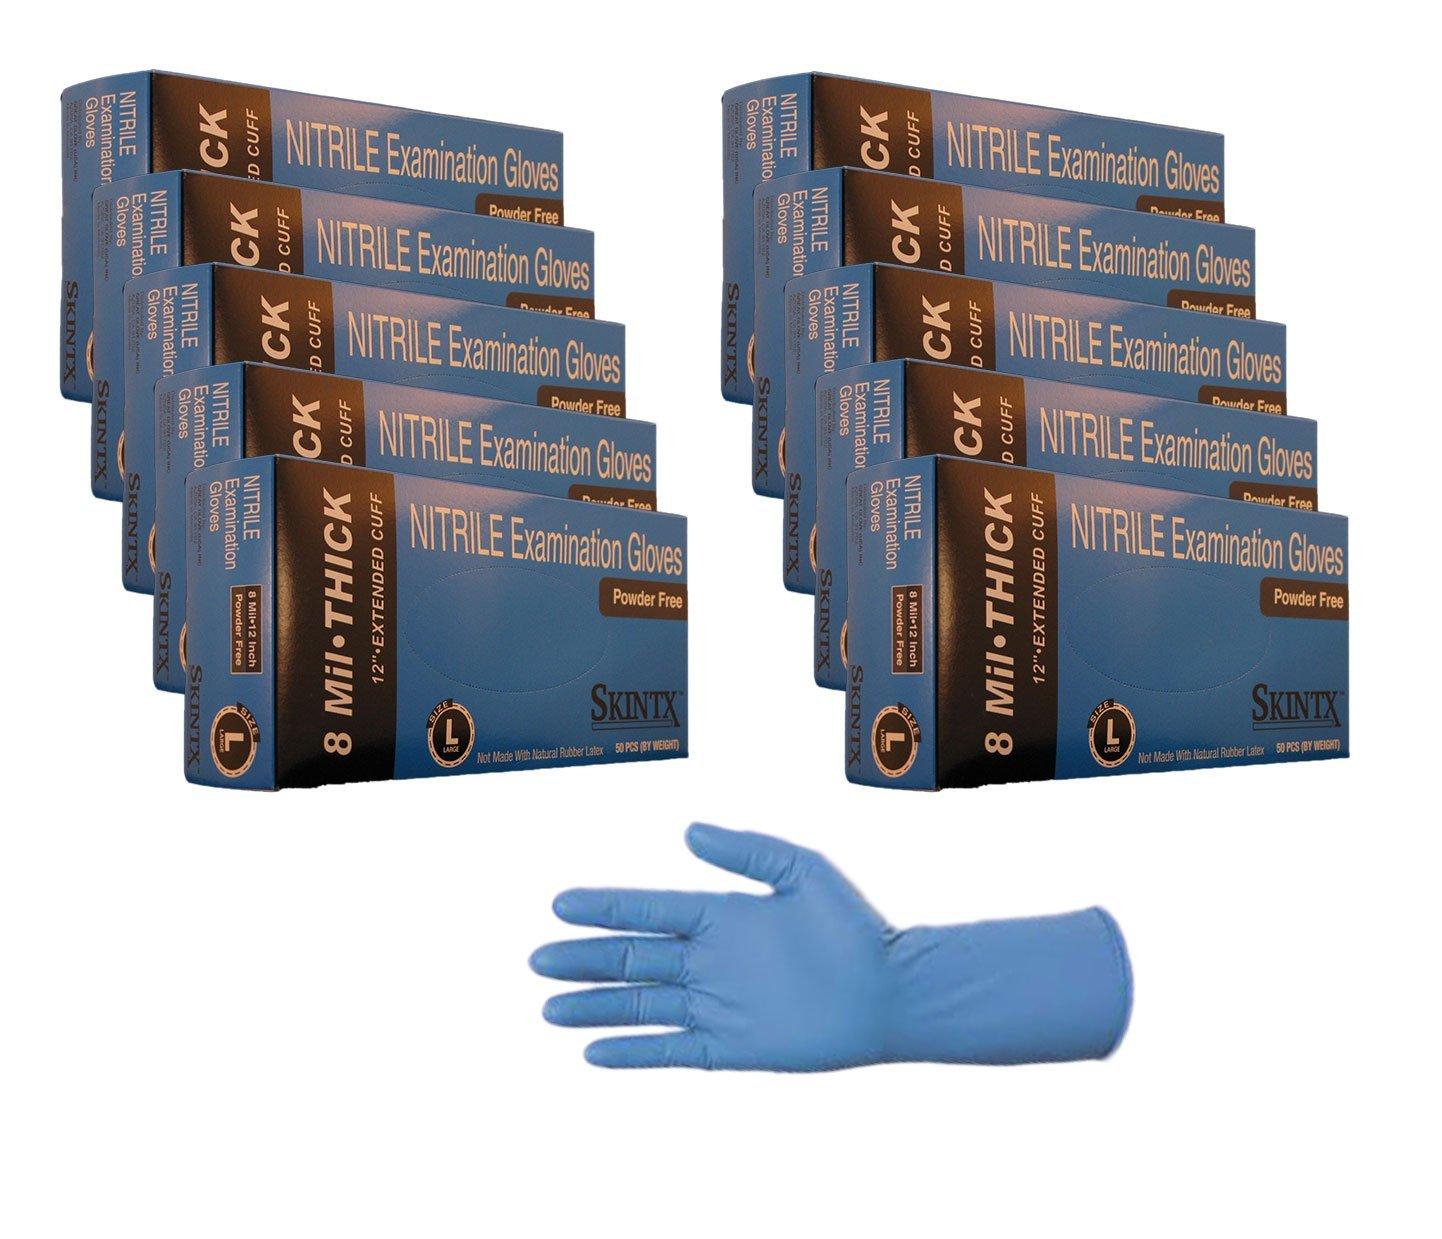 Powder Free Sizes Skintx High Risk Heavy Duty Nitrile Gloves 150, Large 8 mil TG Medical ET50015-Lx3inners Medium-2X-Large,